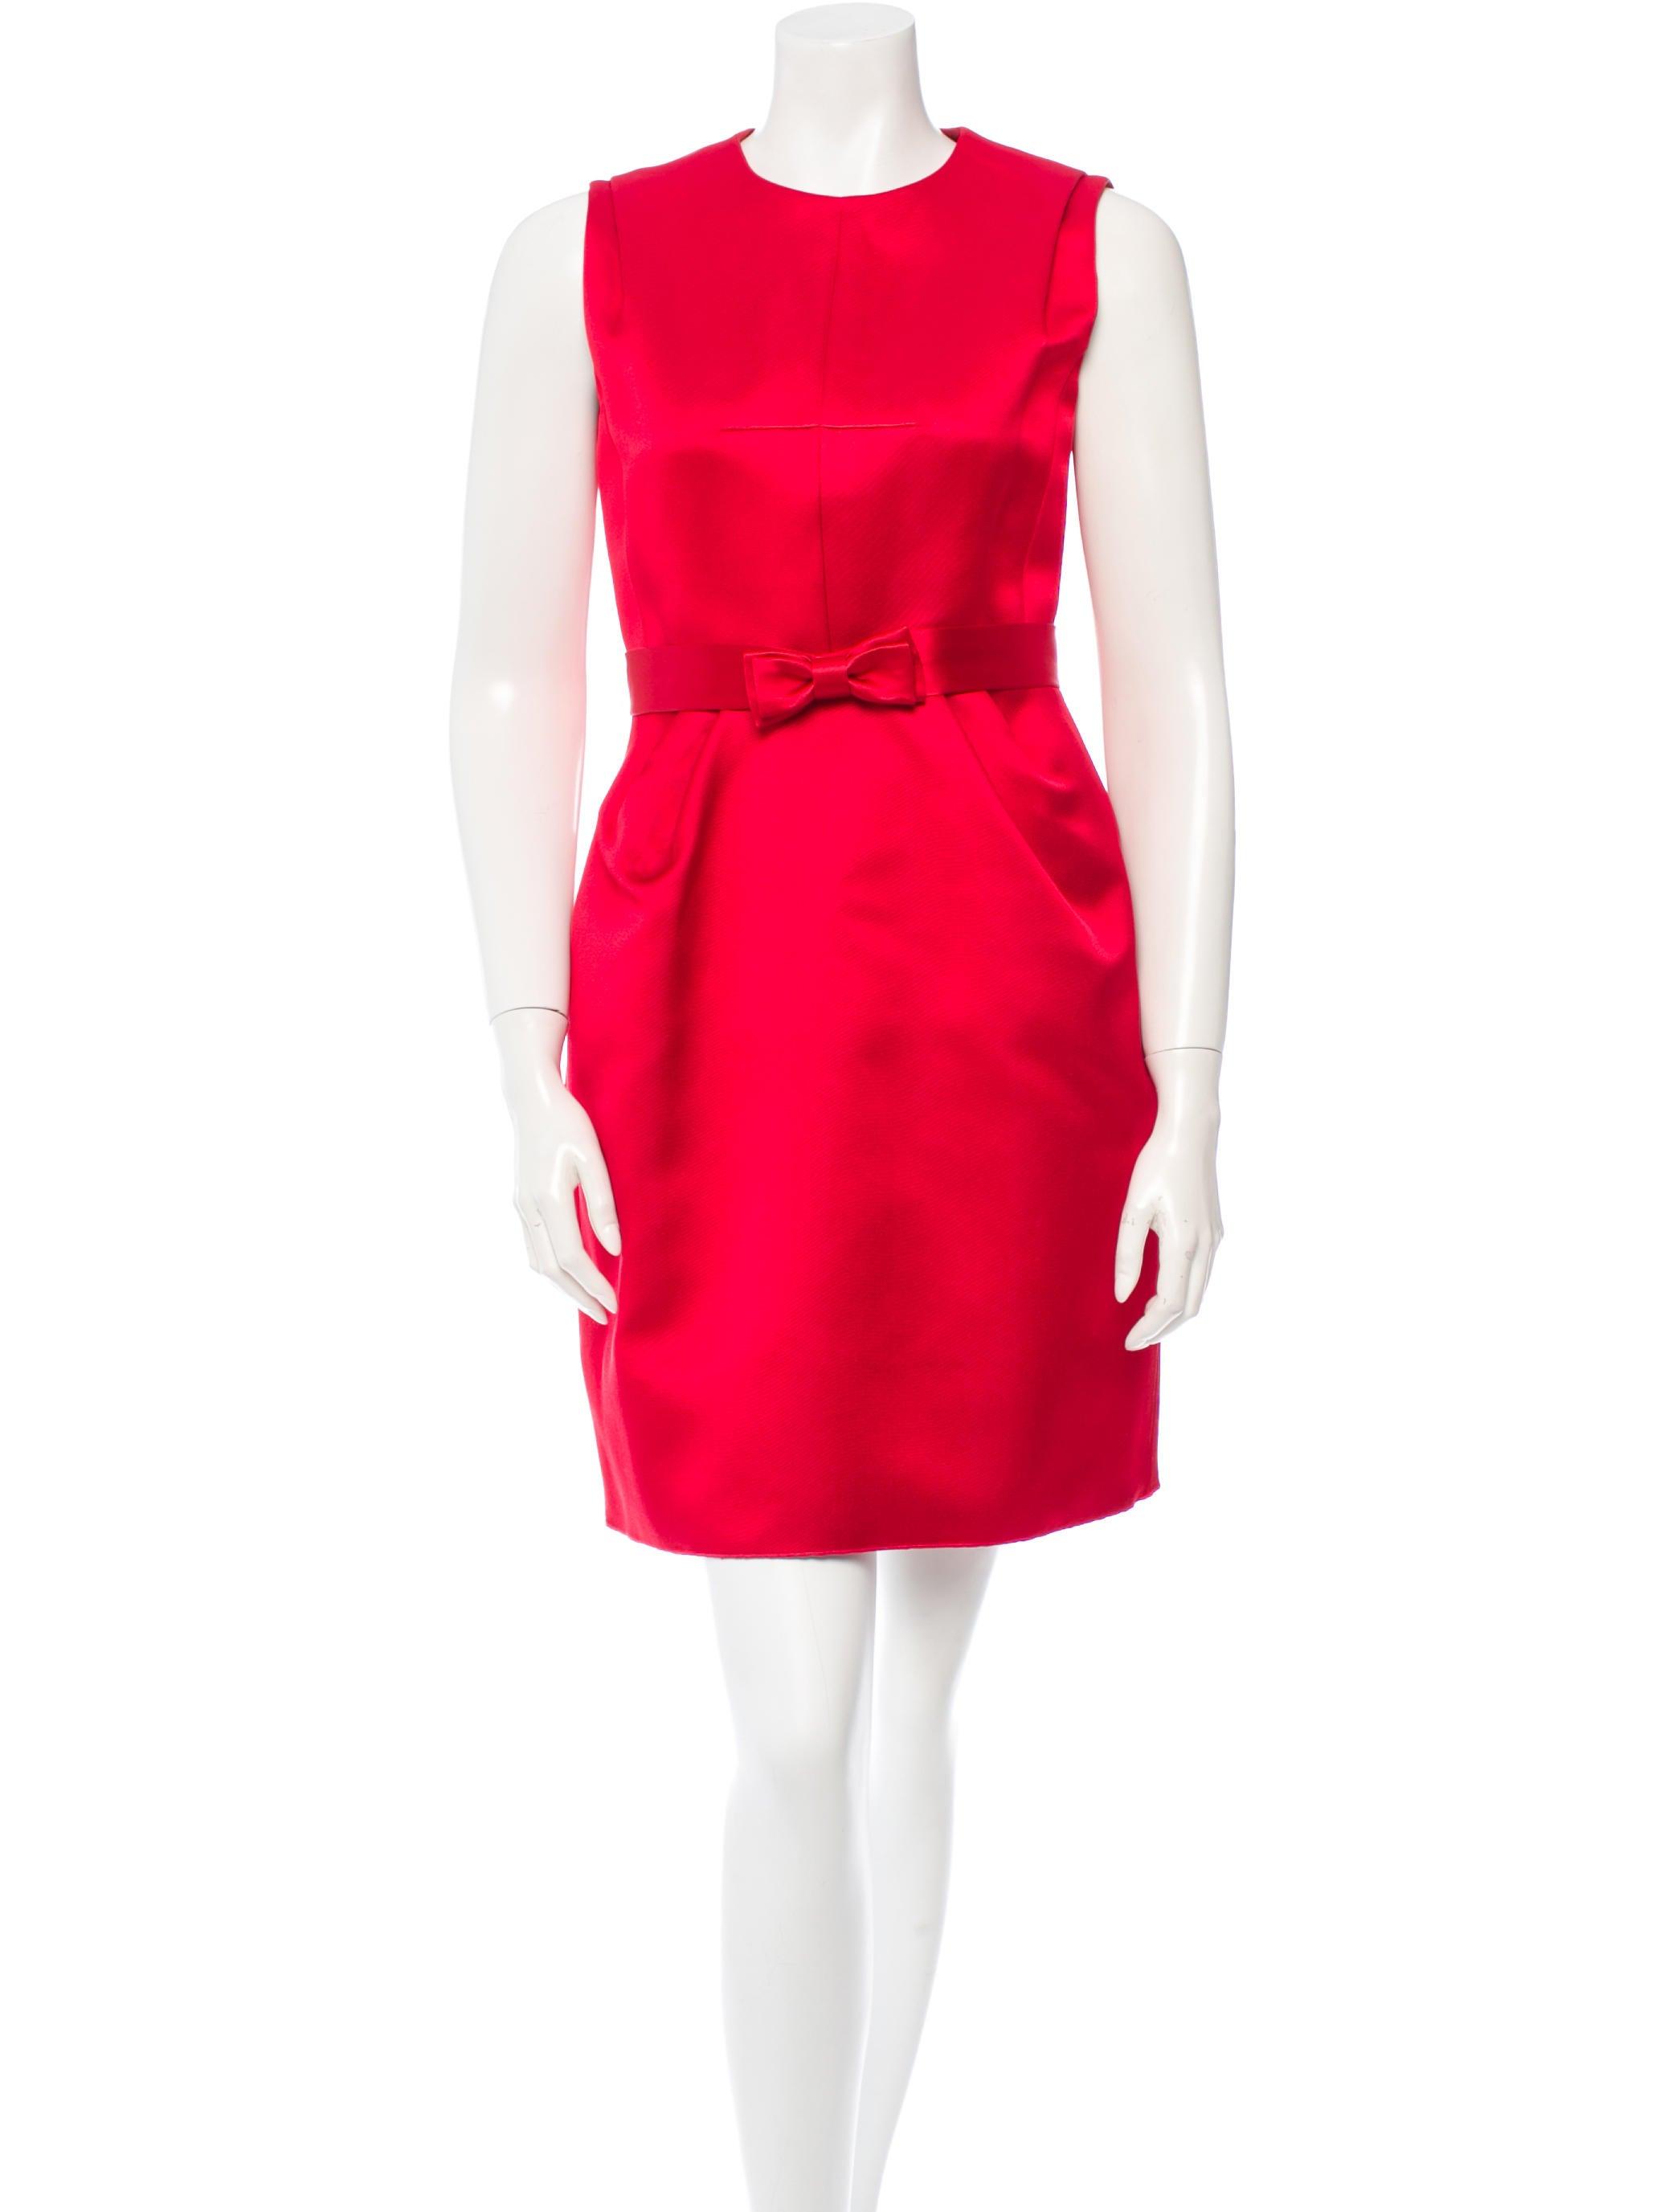 Louis vuitton silk dress dresses lou53158 the realreal